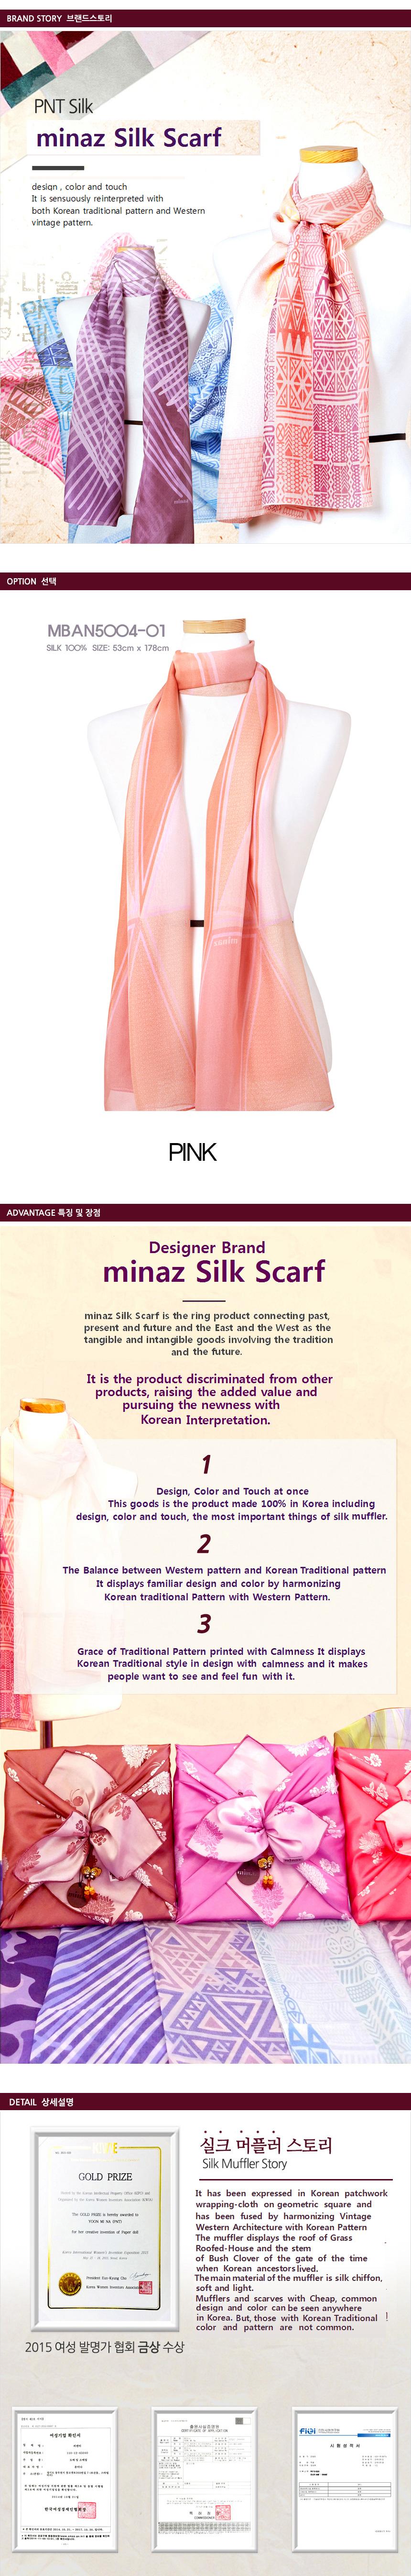 [ minaz ] Silk Scarf_Bangpai-kite